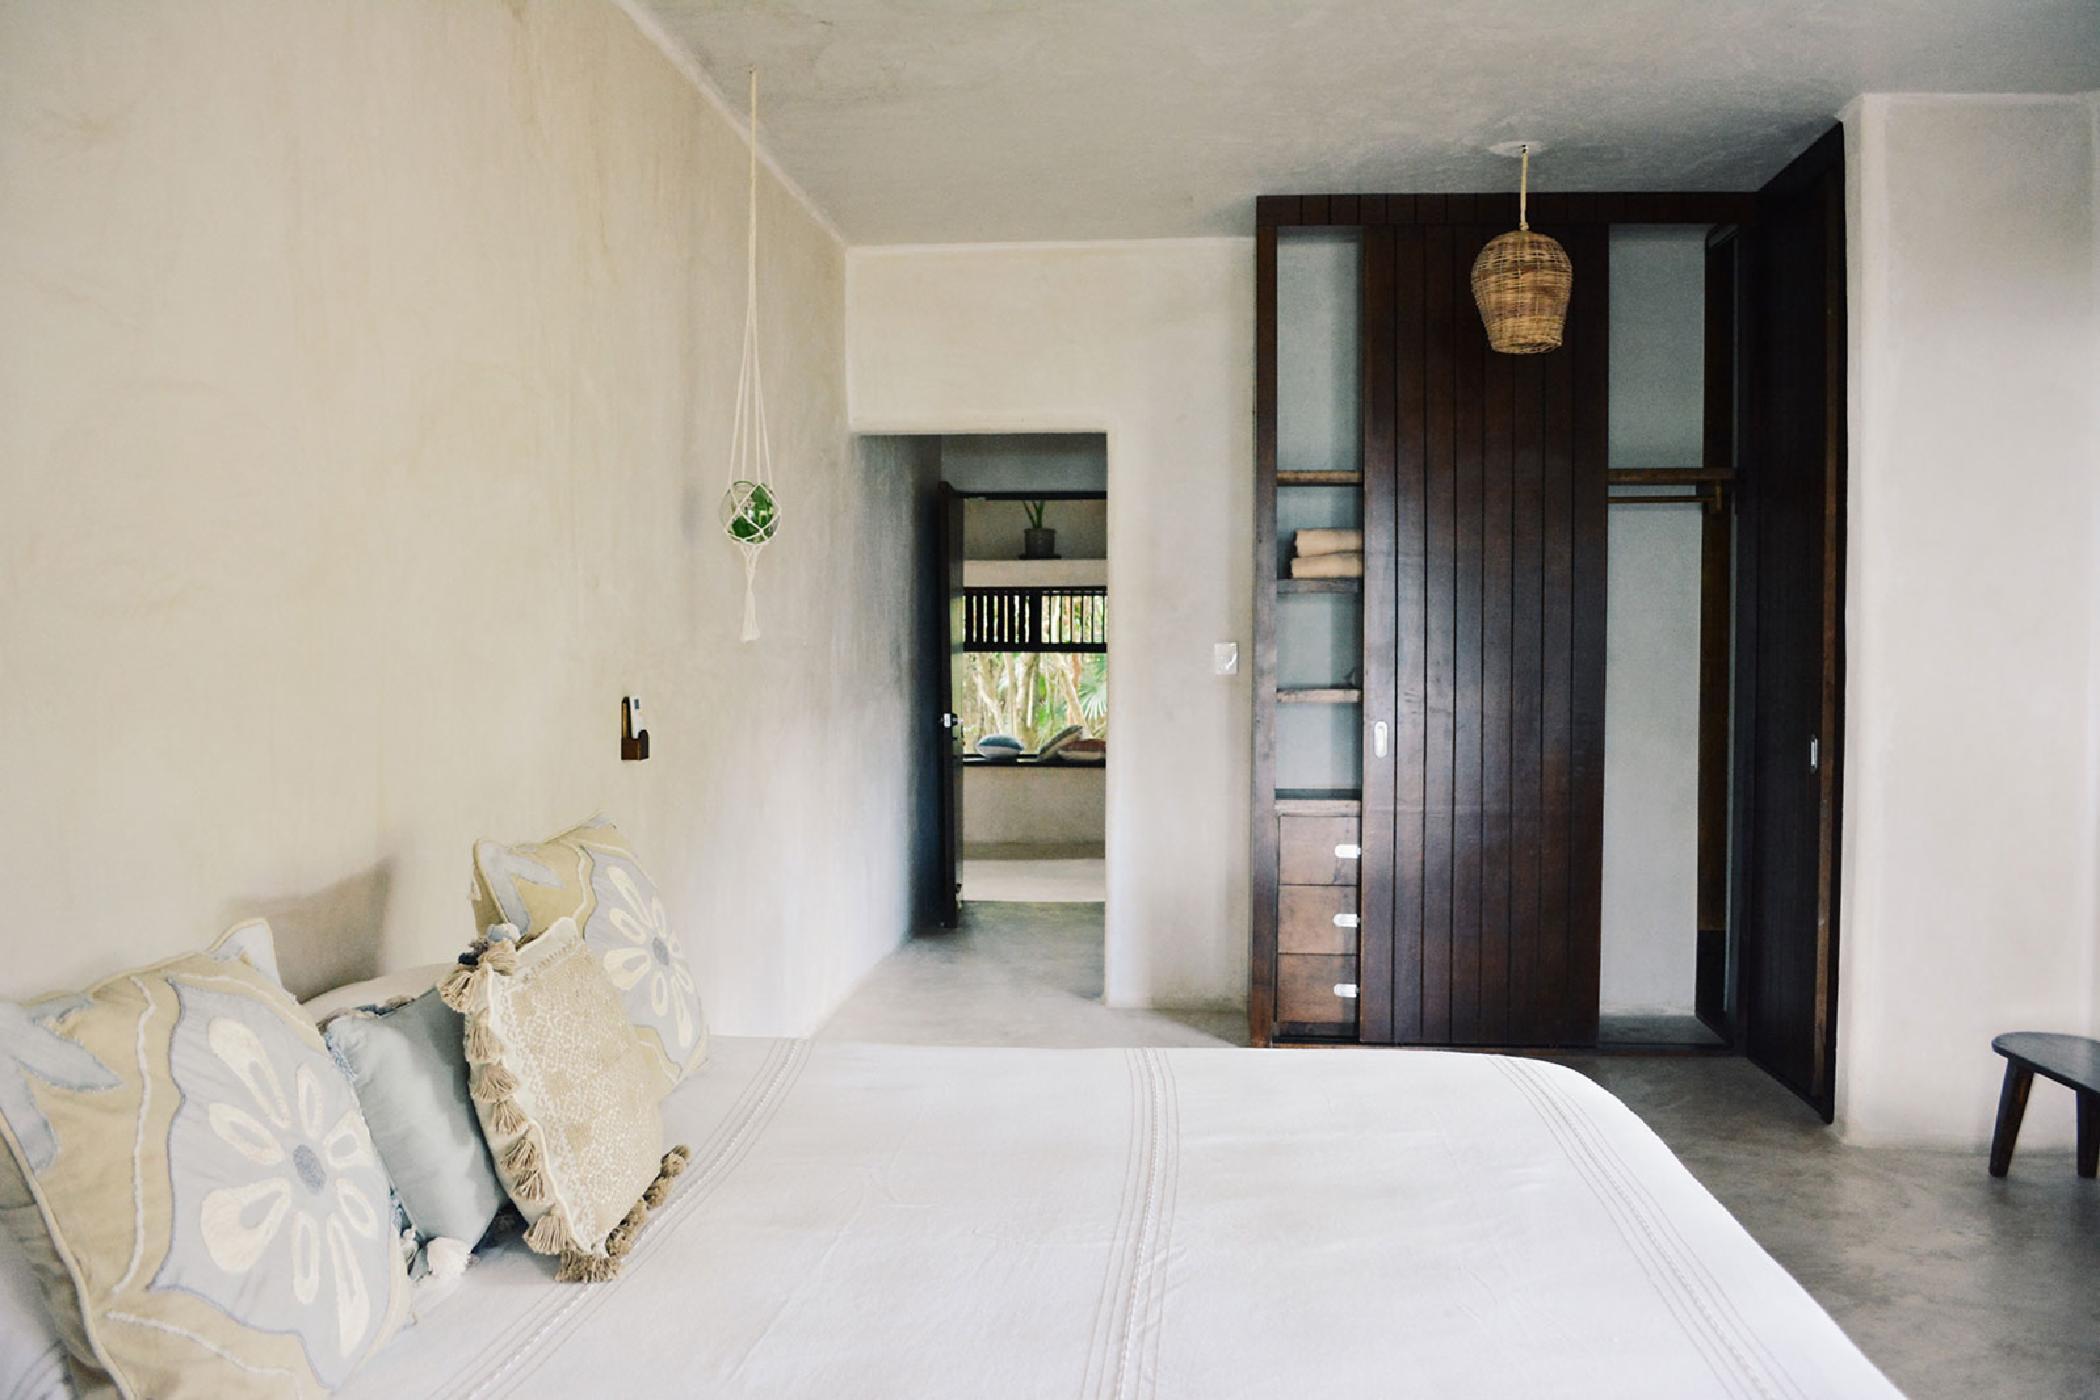 Maya_Luxe_Riviera_Maya_Luxury_Villas_Experiences_Hotel_Zone_Tulum_Beach_5_Bedrooms_Casa_Palapa_15.jpg